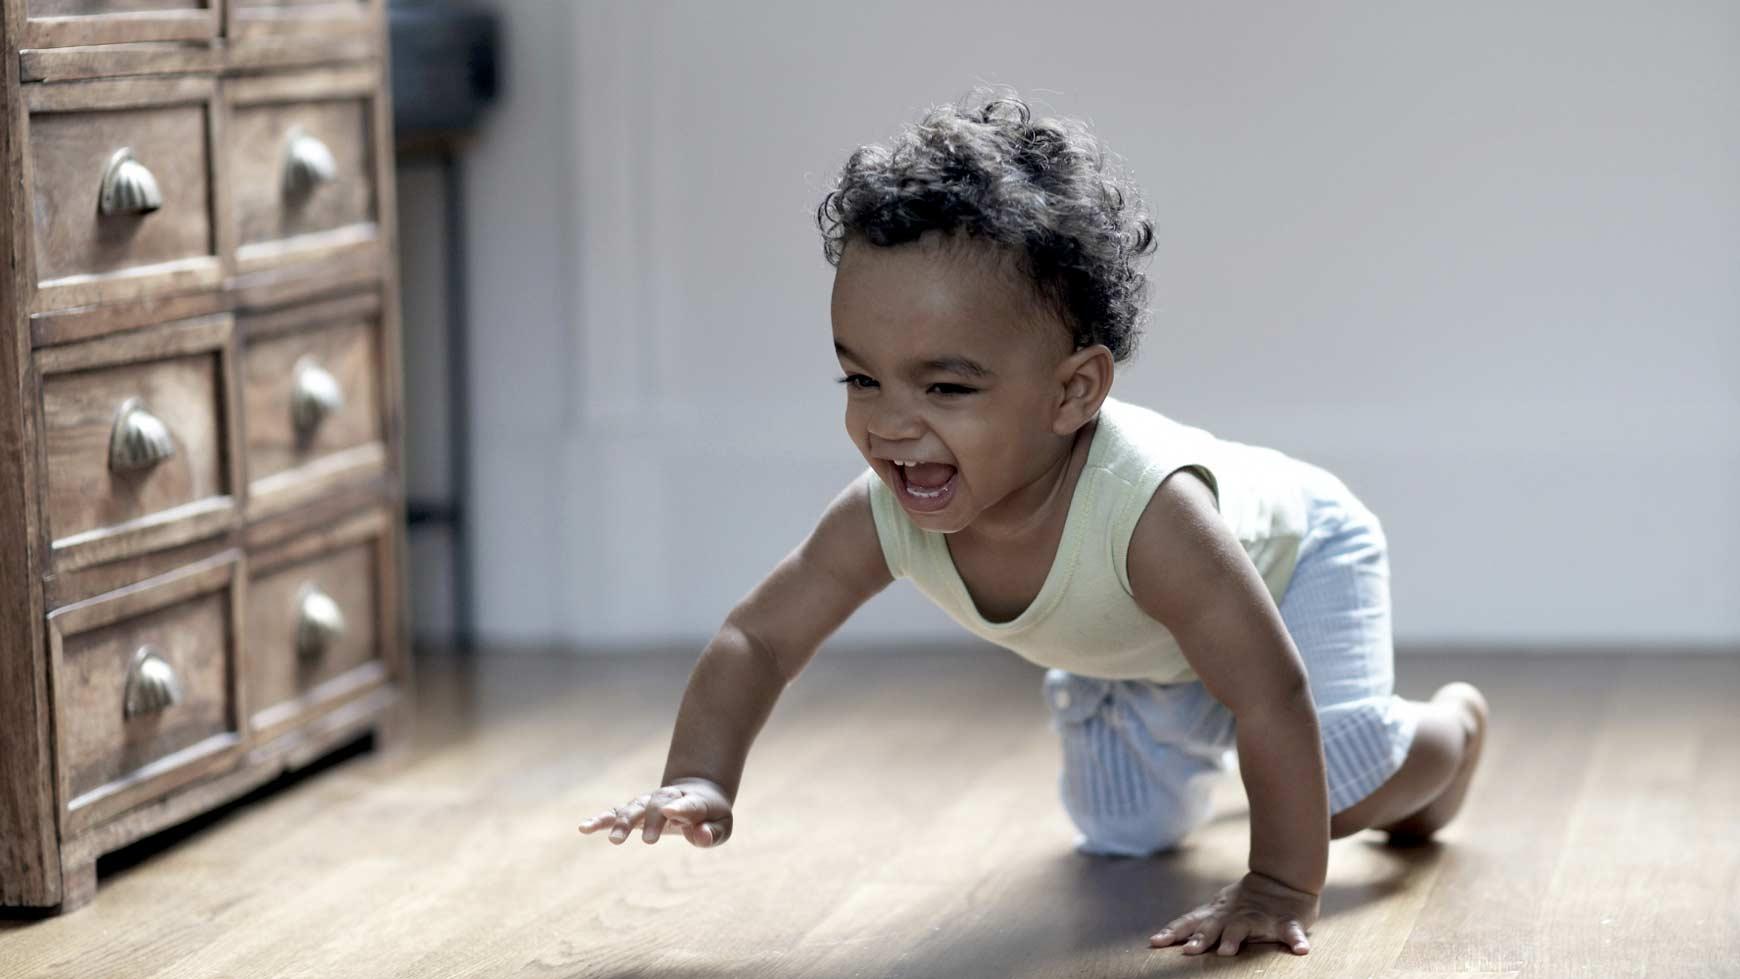 Developmental Milestones From Birth to Age 1